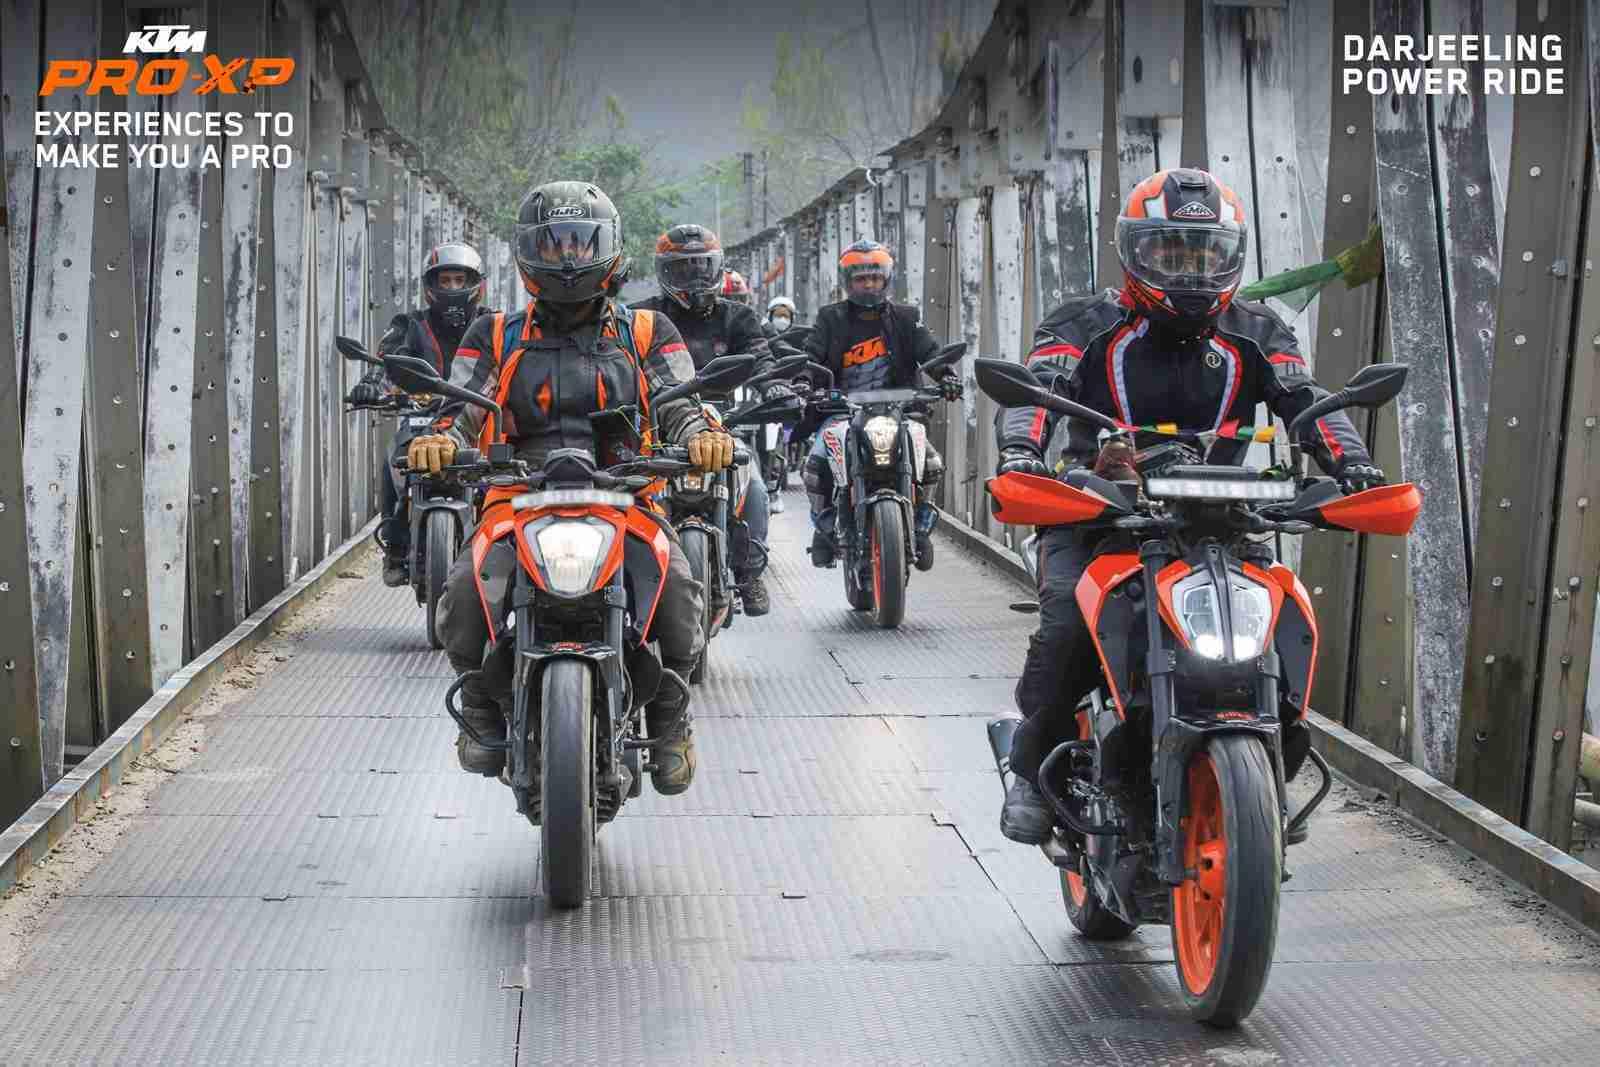 KTM India Pro-XP rides Power Rides